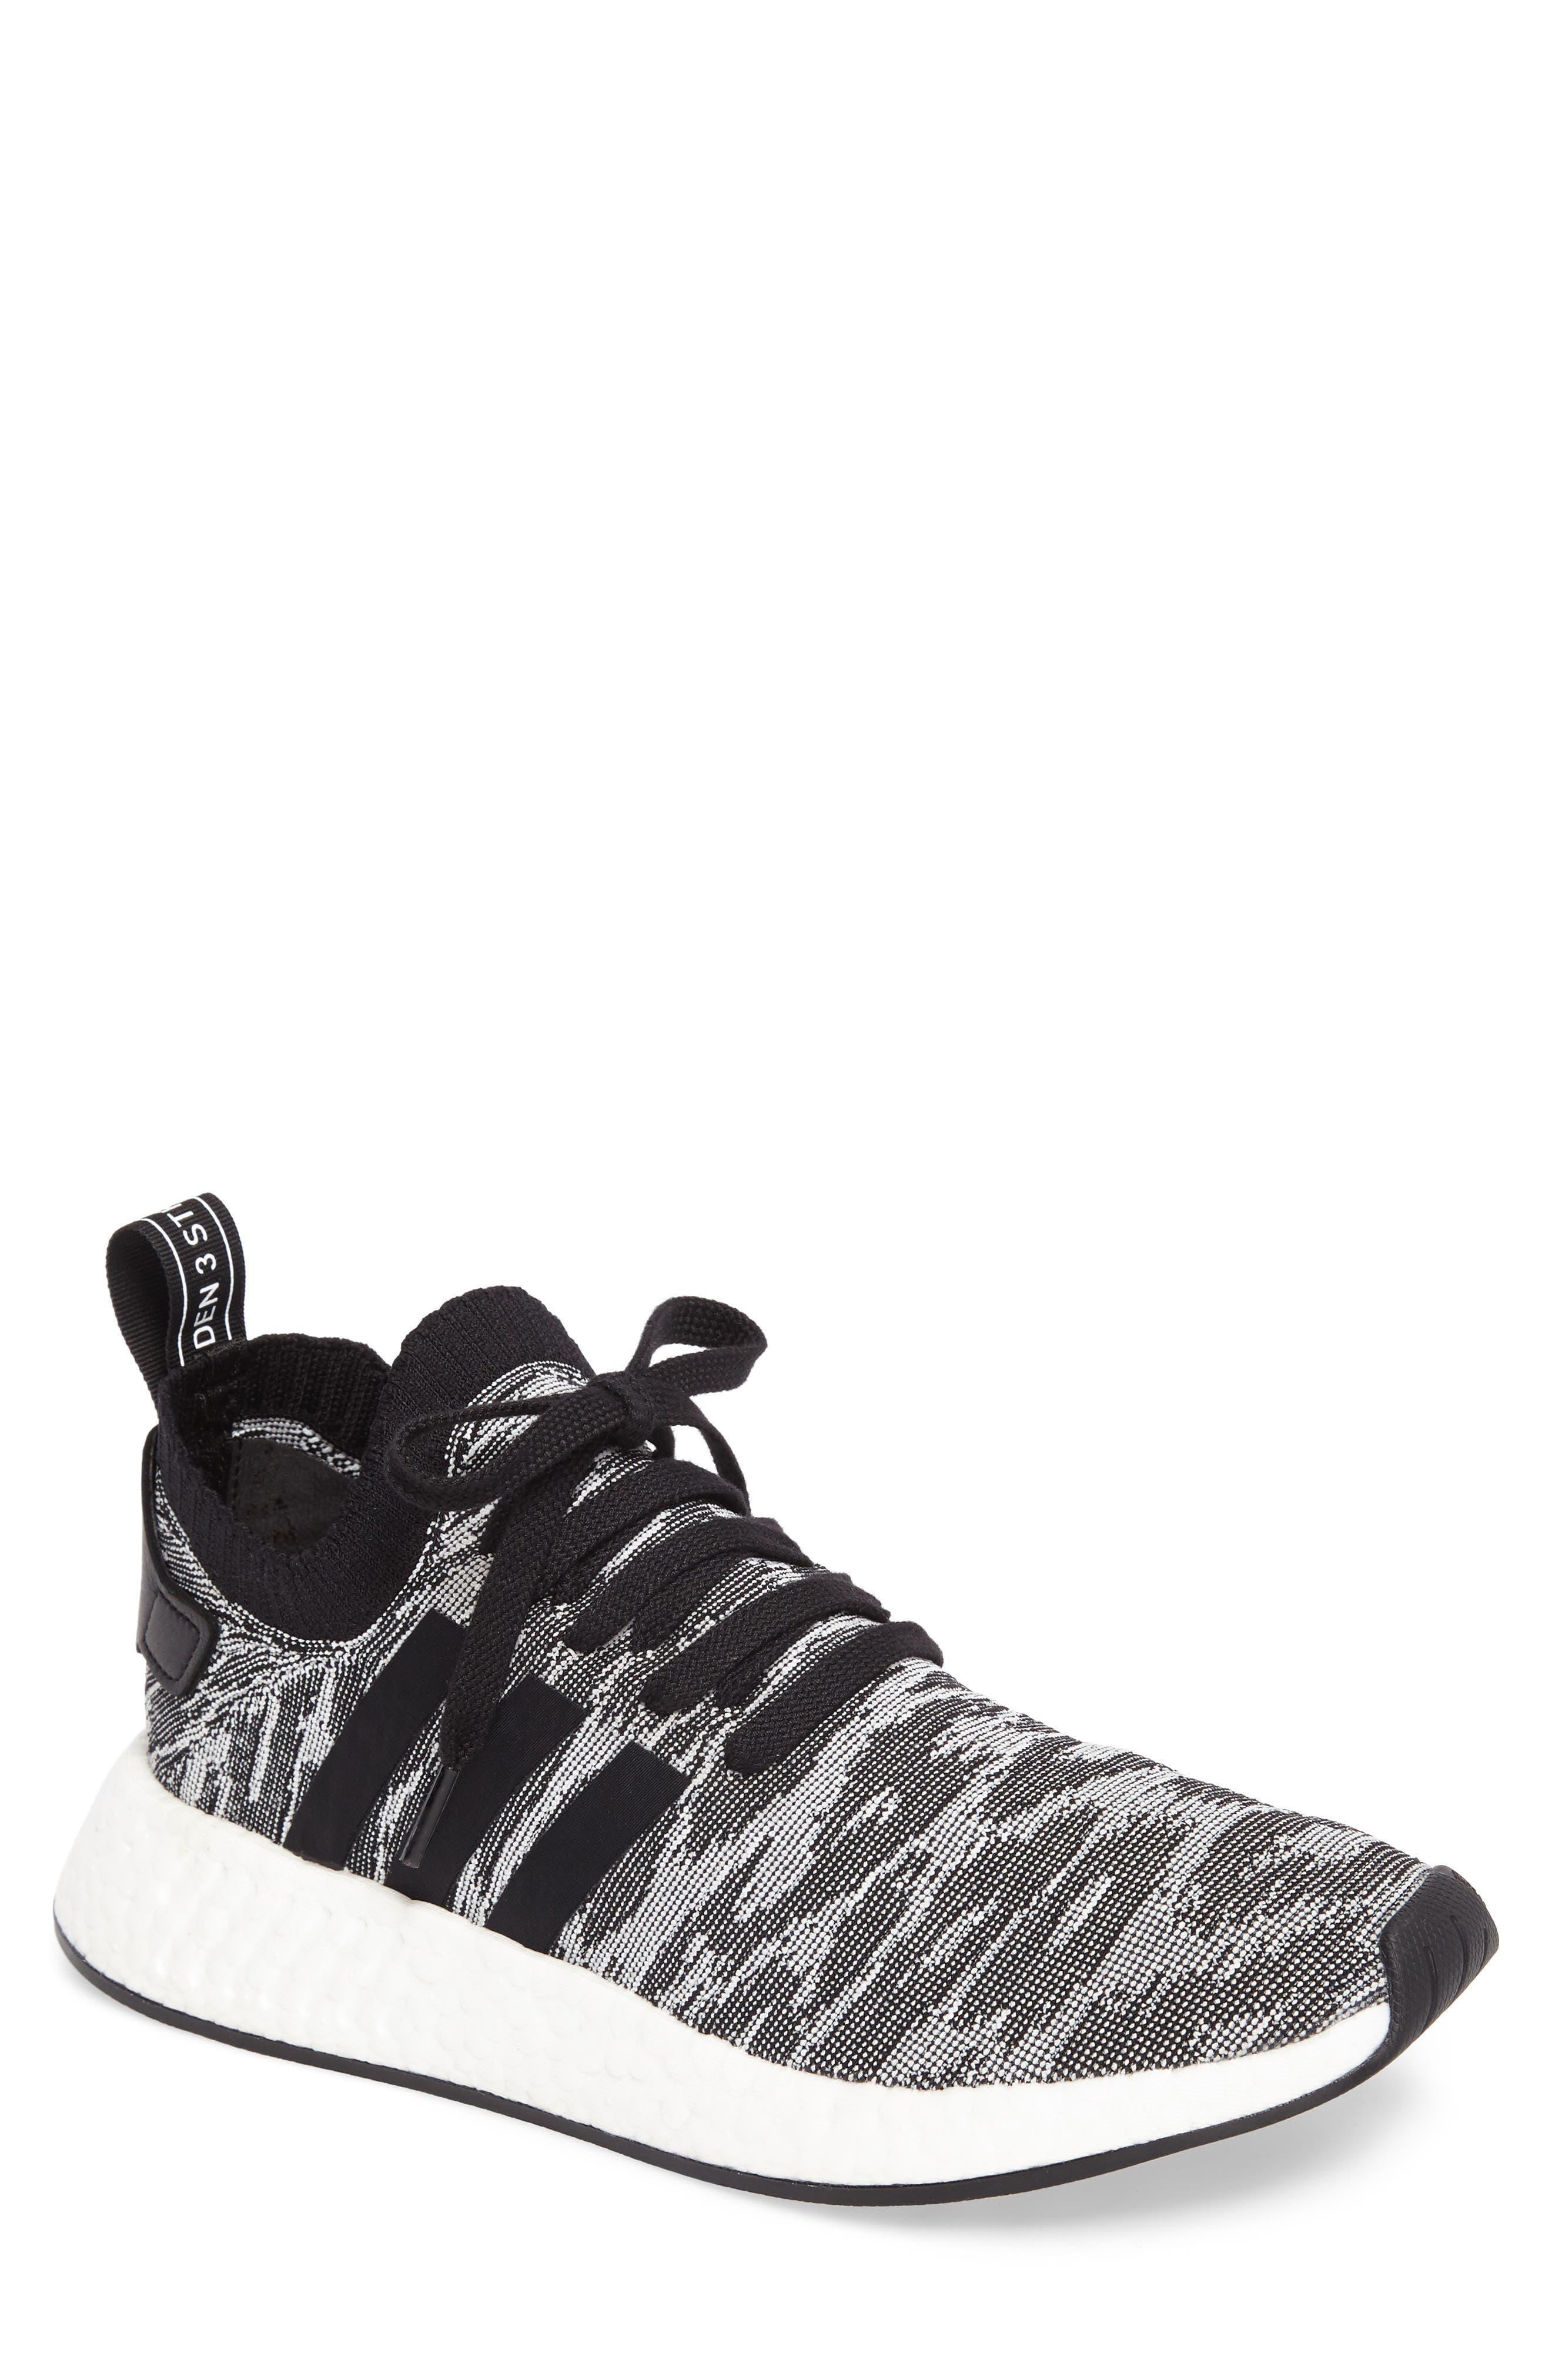 Alternate Image 1 Selected - adidas NMD R2 Primeknit Running Shoe (Men)